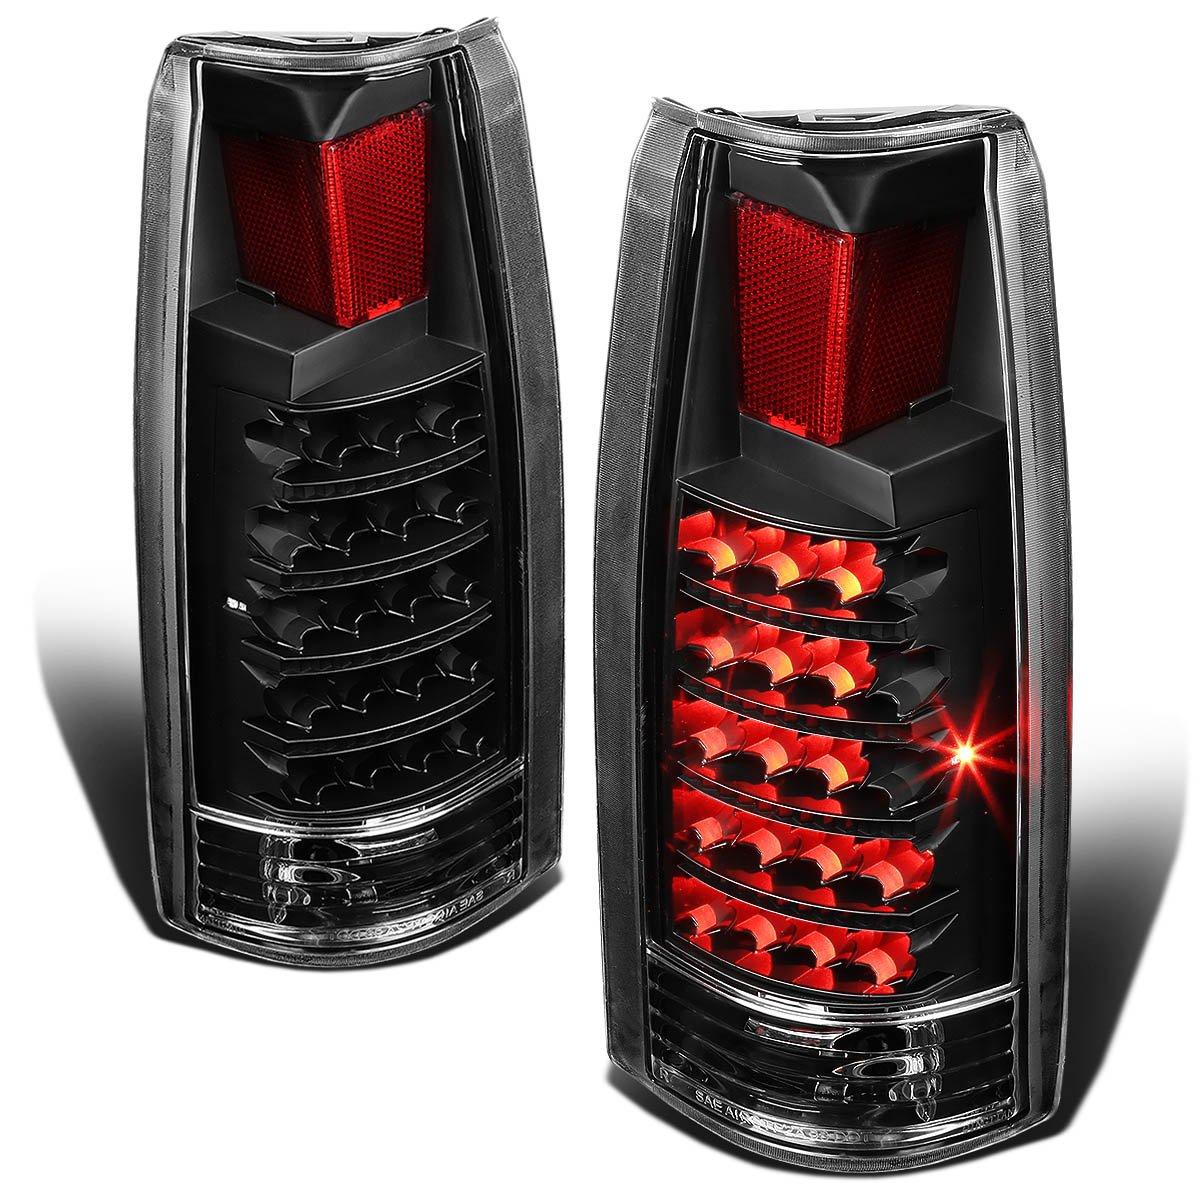 DNA TL-C10-LED-BK-CL Chevy C/K Series Black Clear Lens LED Tail Light DNA MOTORING